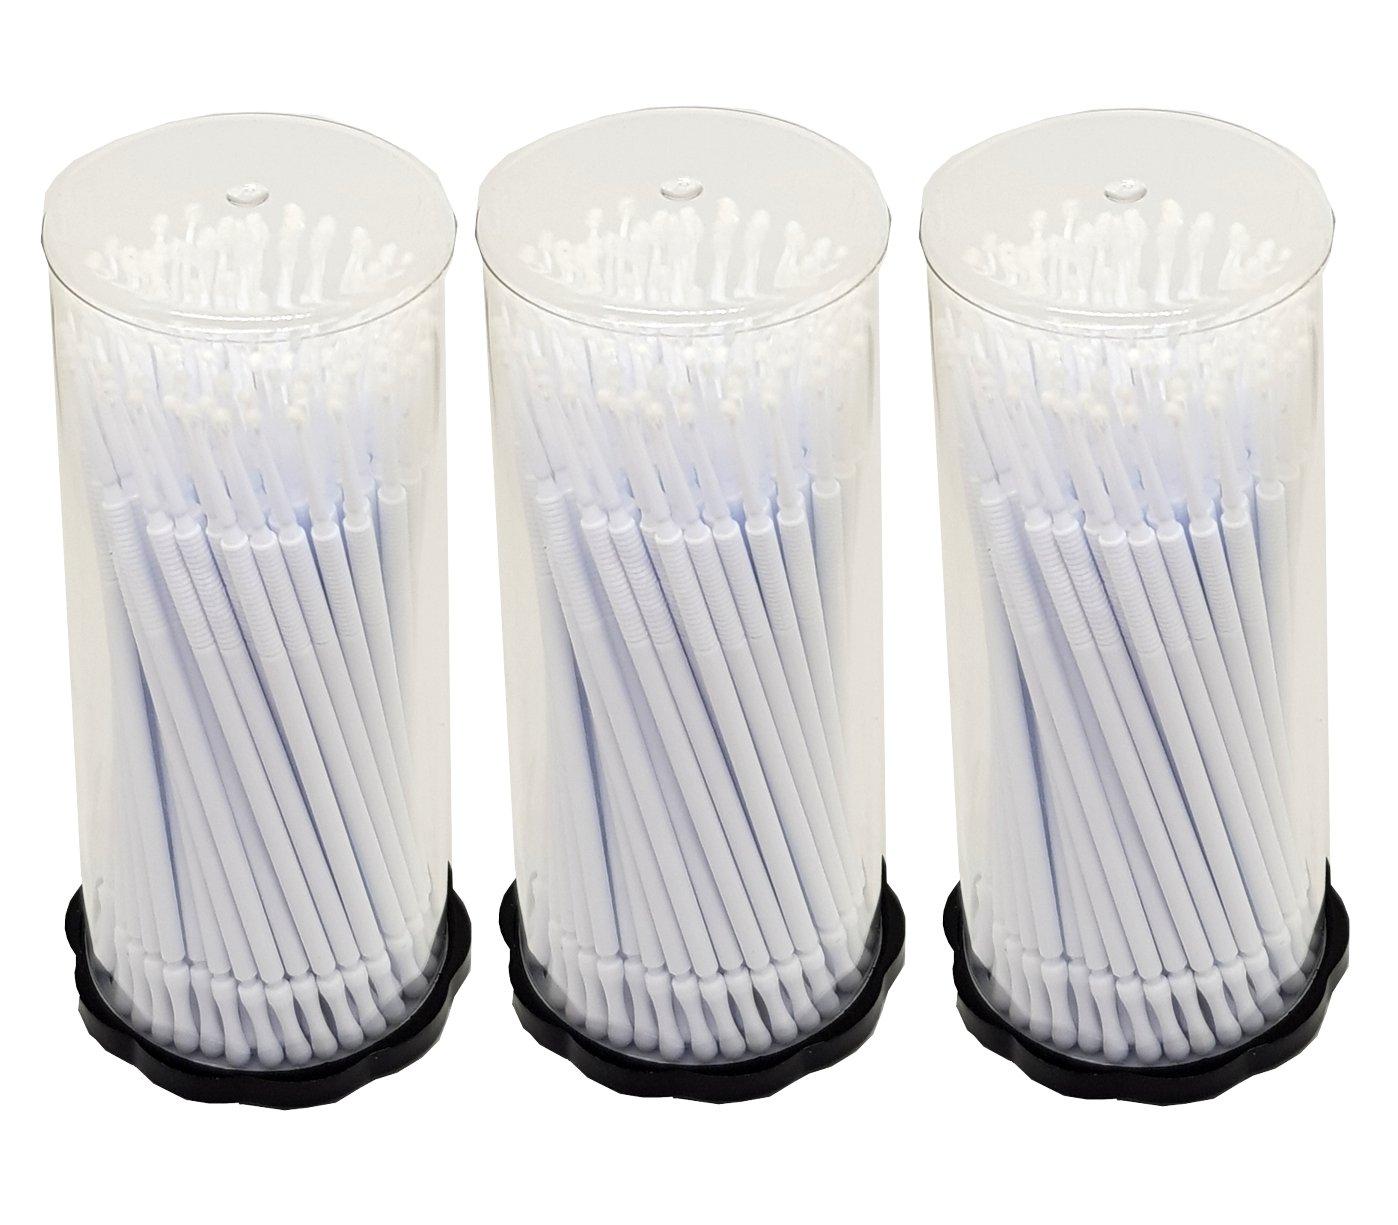 Dermastiil pack of 3tubes x 100 of disposable, microfibre cleaning sticks for eyelash extensions, applicators, white, 1.5mm 1.5mm Dermastil